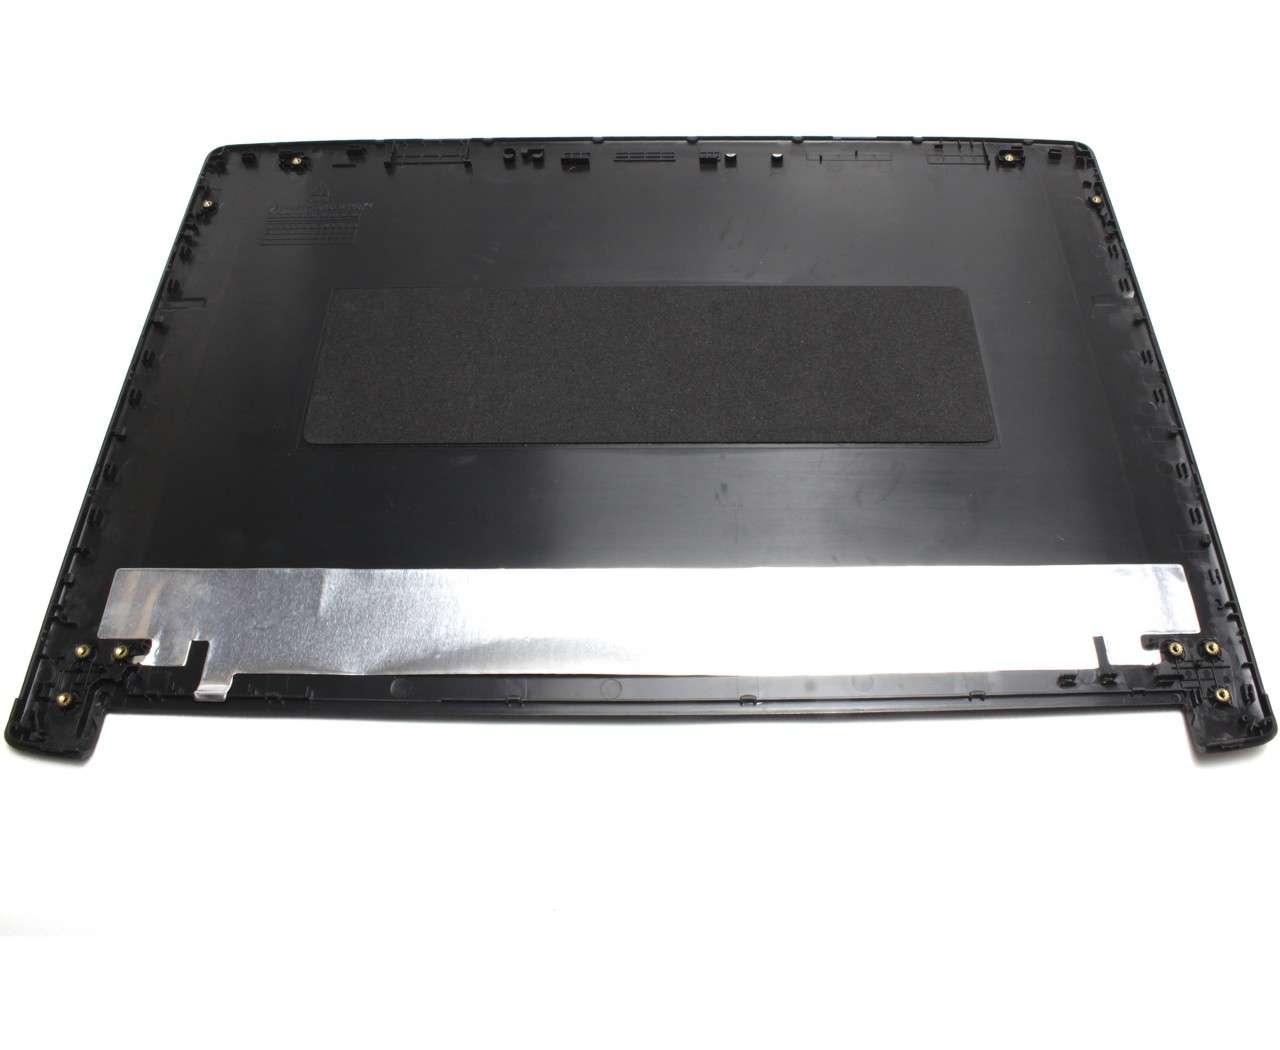 Capac Display BackCover Acer A715-71 Carcasa Display imagine powerlaptop.ro 2021